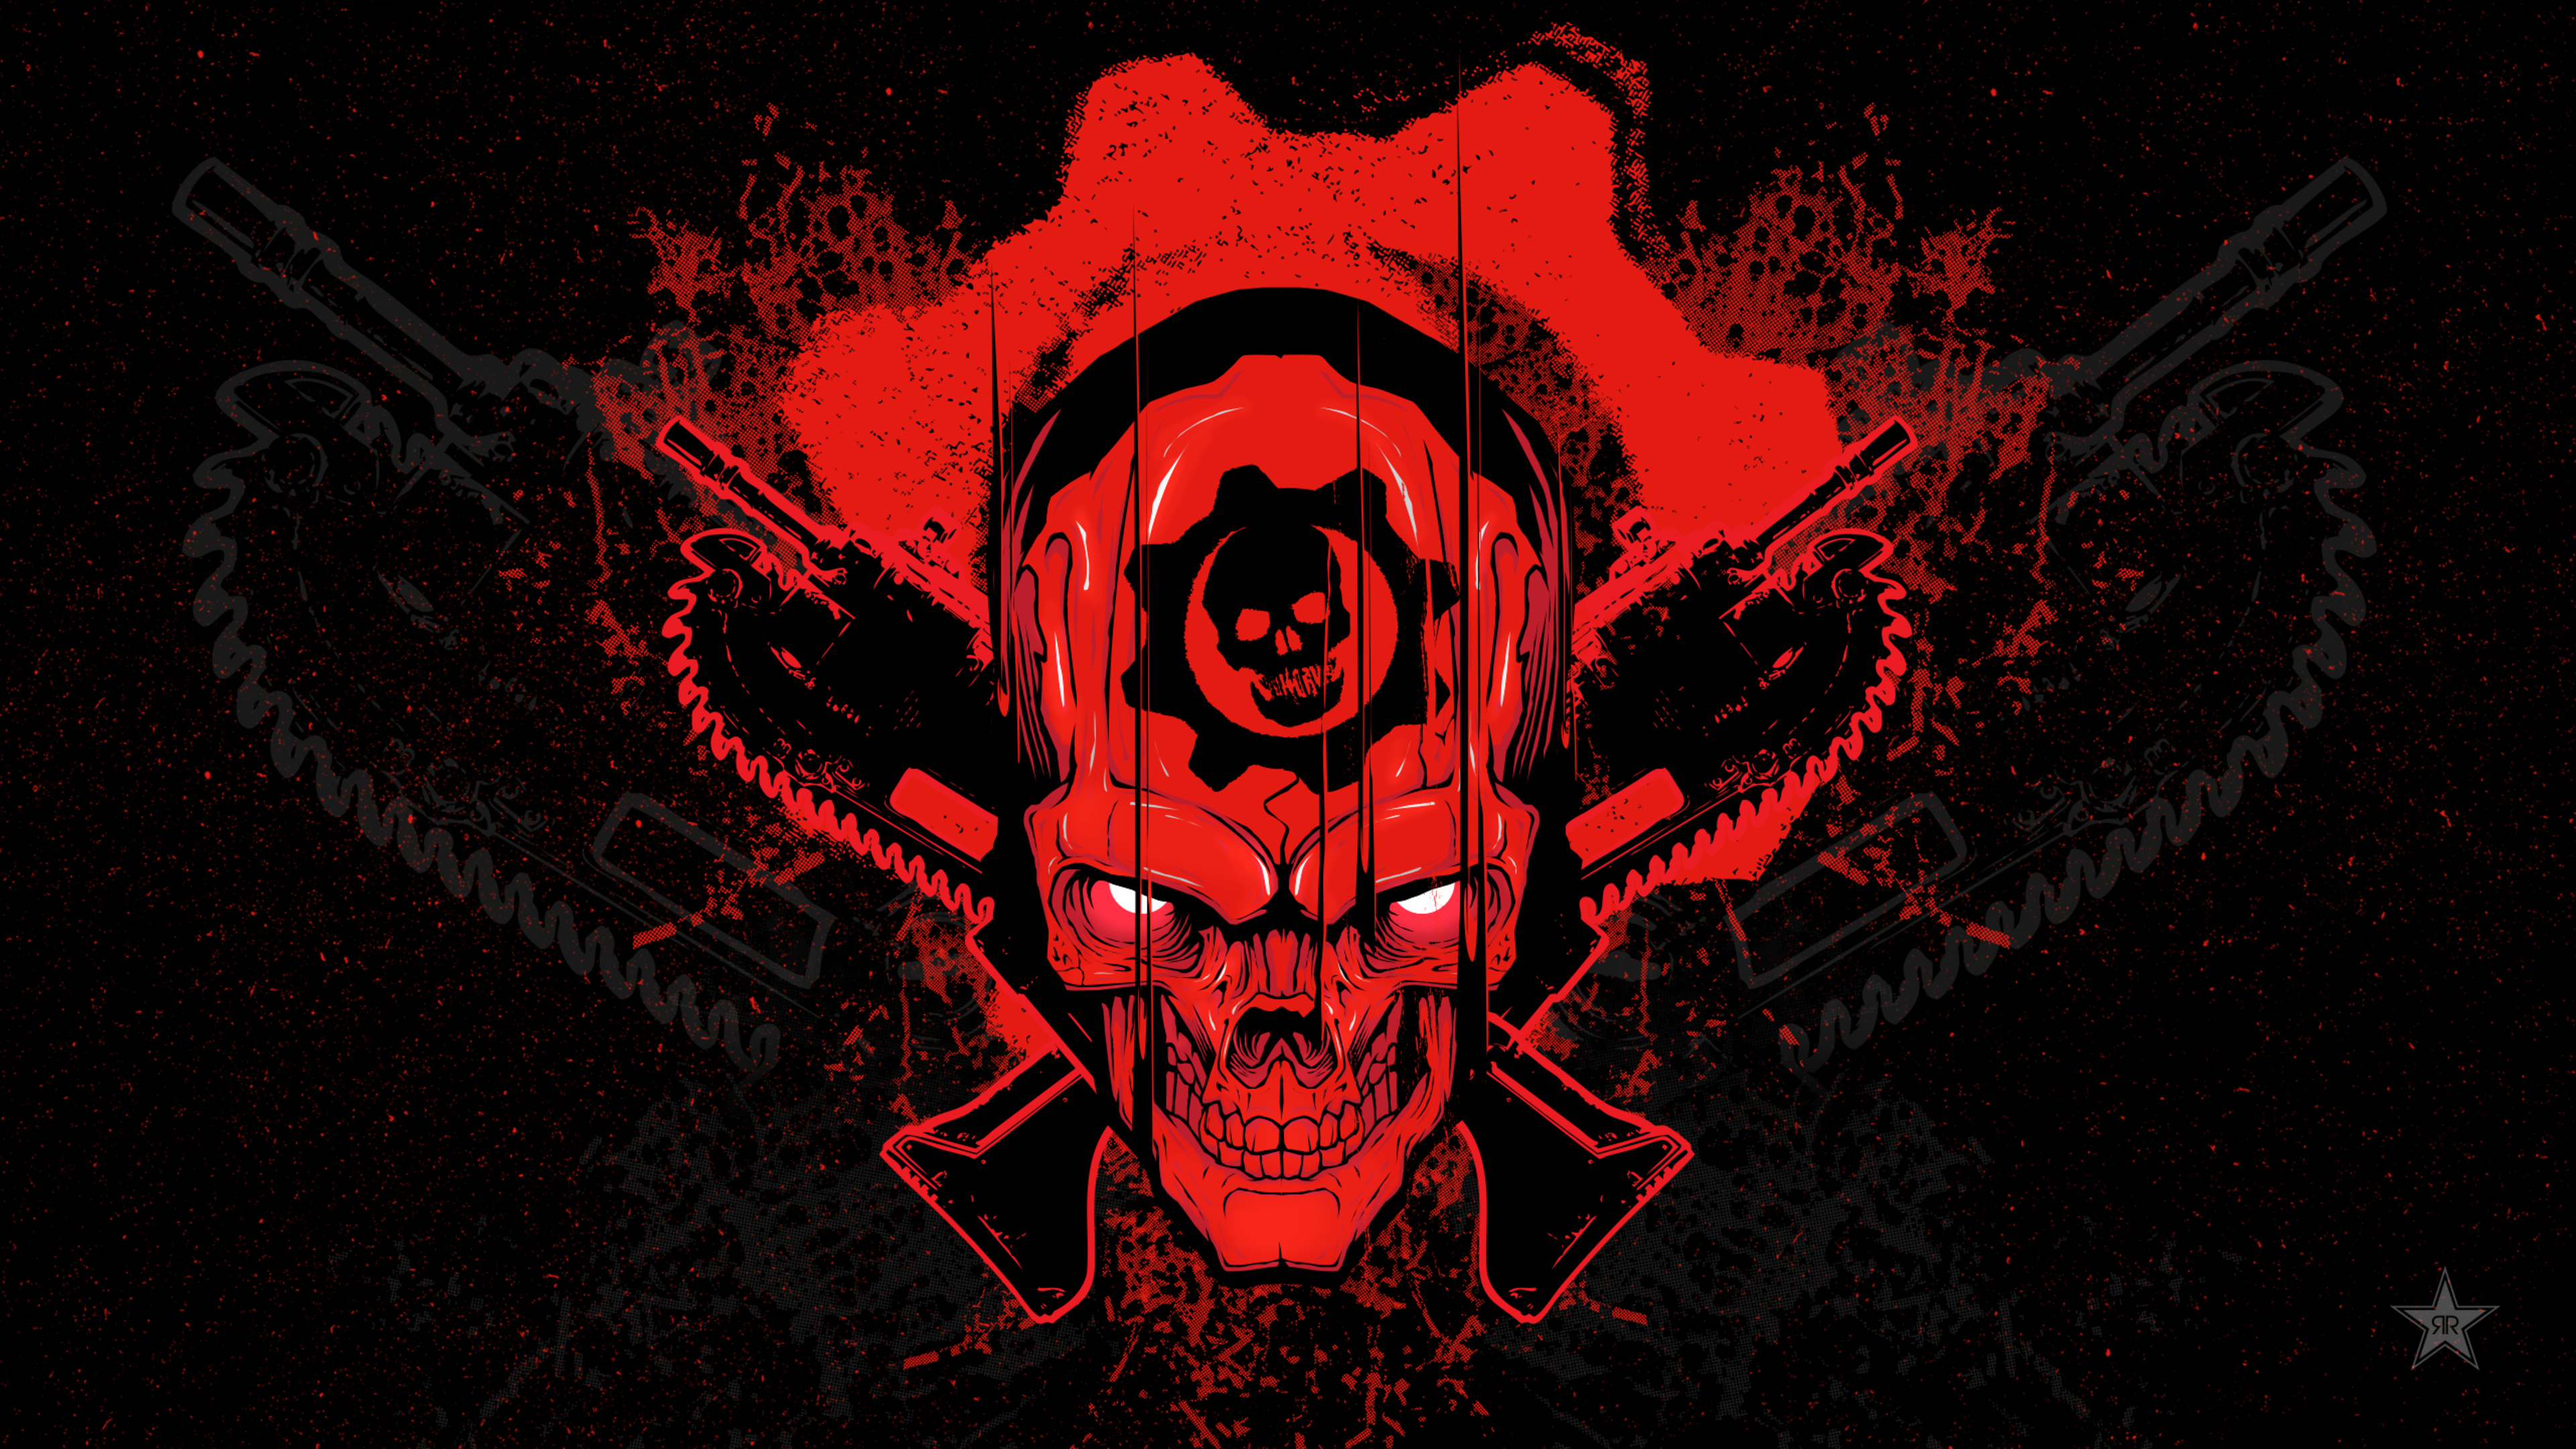 3840x2160 gears of war 4 skull 4k hd 4k wallpapers images - Skull 4k images ...